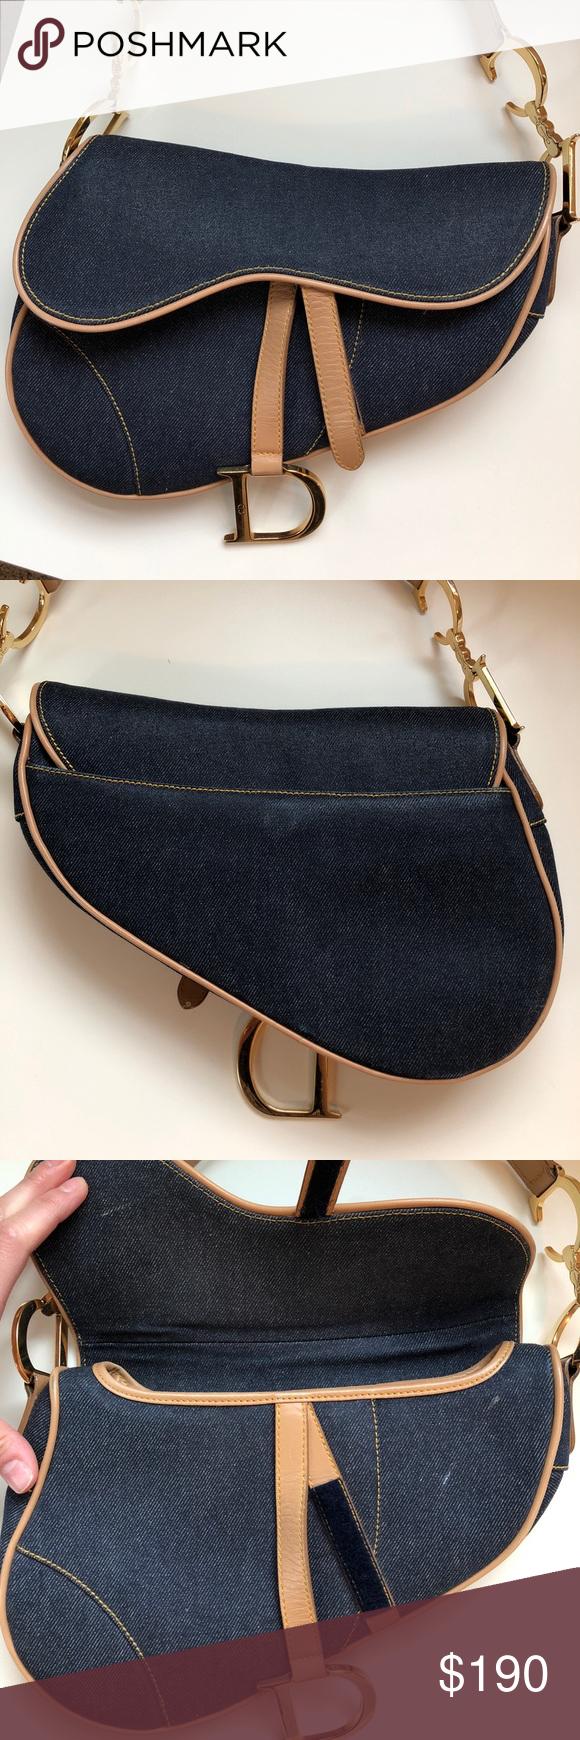 Authentic Dior Denim Saddle Bag Dior Saddle Bag Bags Christian Dior Bags